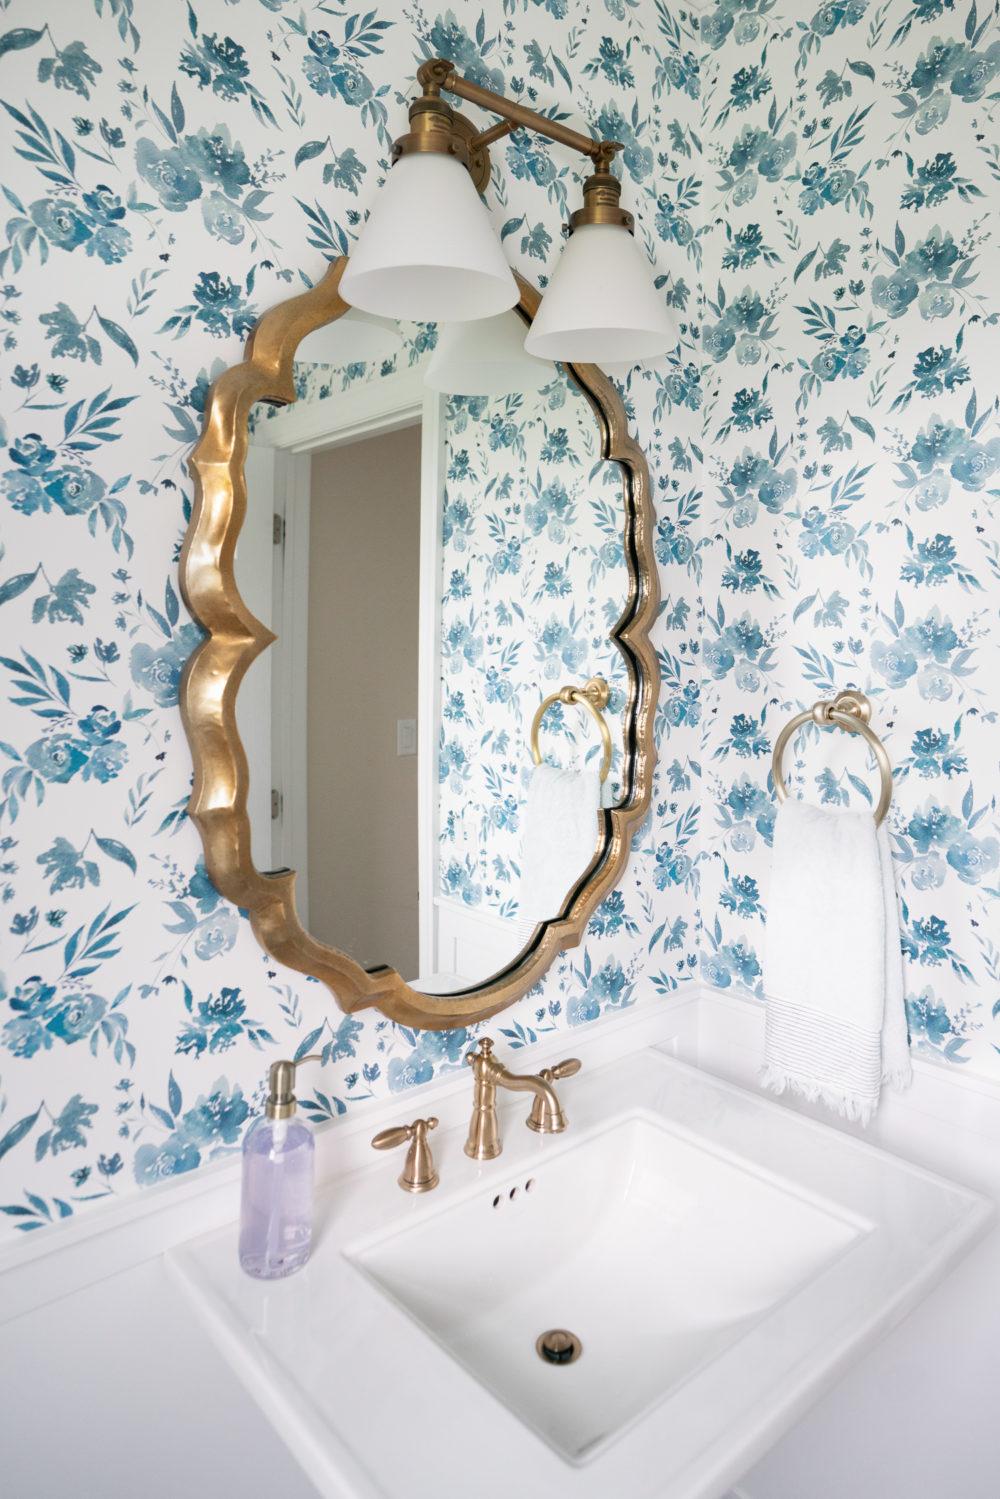 Petite Fashion Blog | Caitlin Wilson Wallpaper | Caitlin Wilson Rugs | Powder Room Ideas | Powder Room Makeover